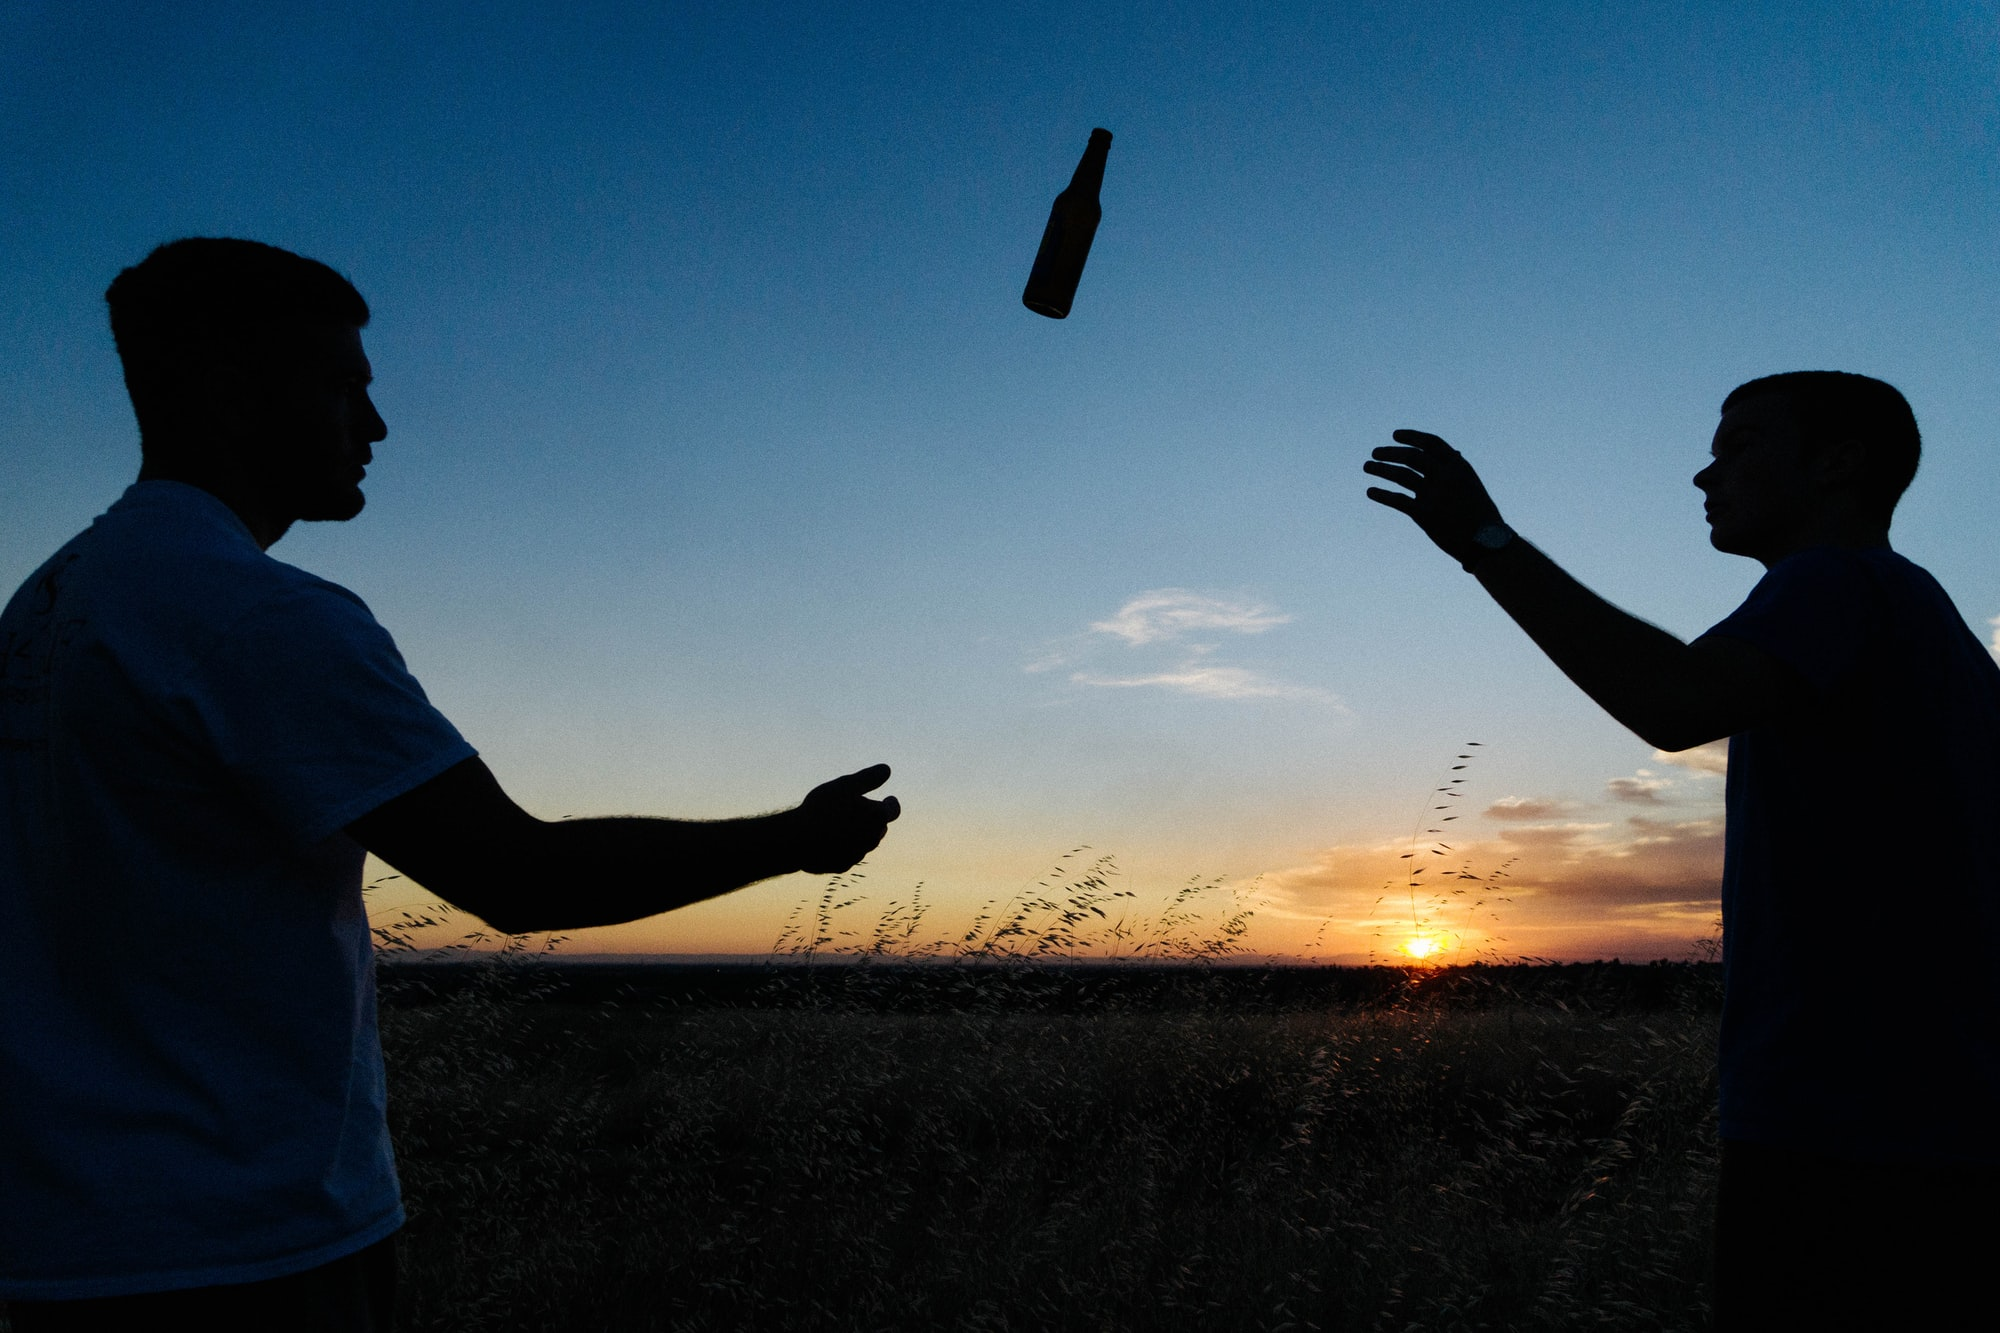 Man throwing a beer